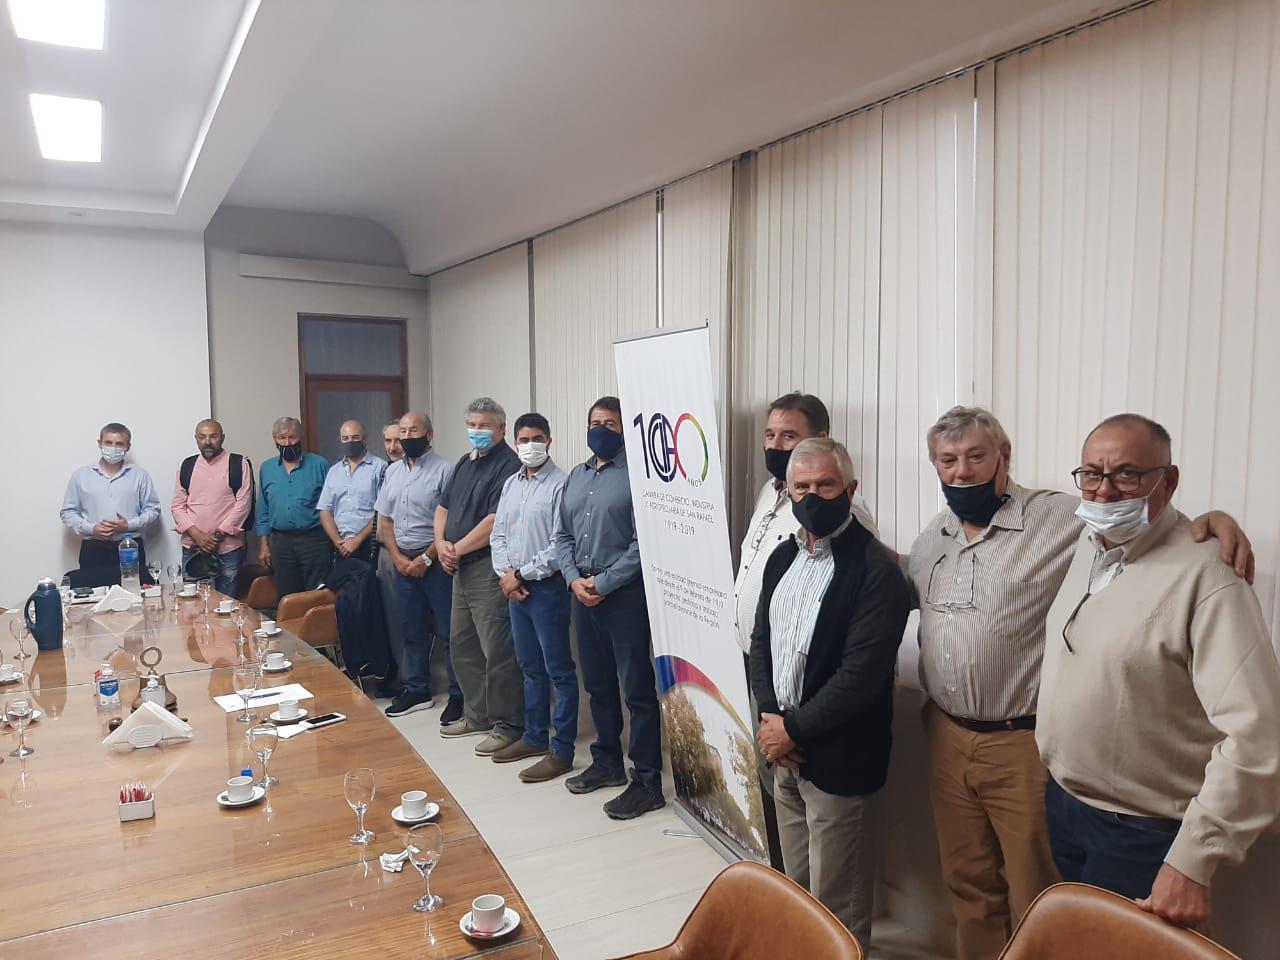 reunion-camara-san-rafael-ministro-isgro-paso-las-lenas-acueducto